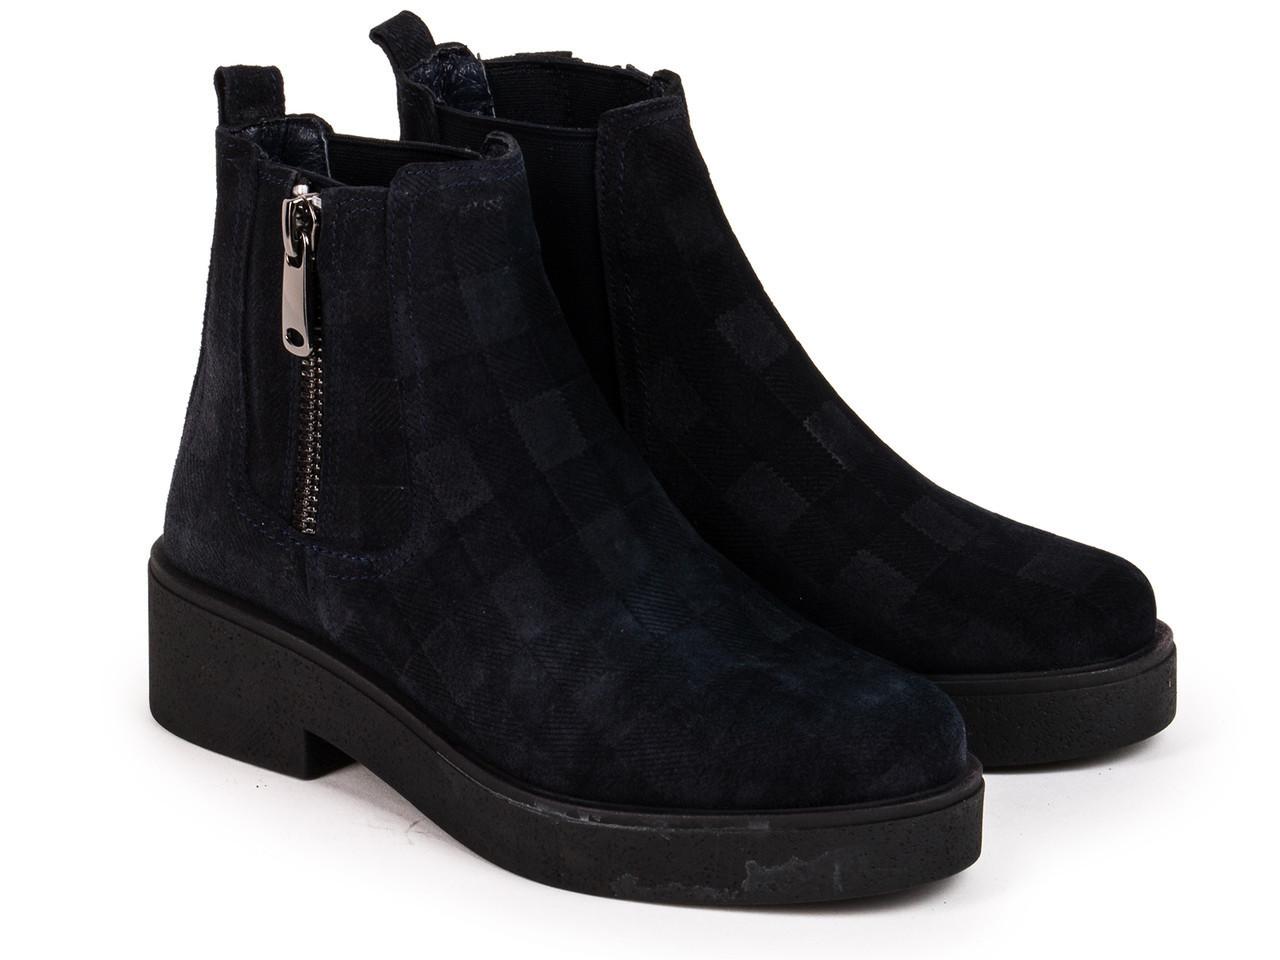 Ботинки Etor 5605-02140-1 37 синие